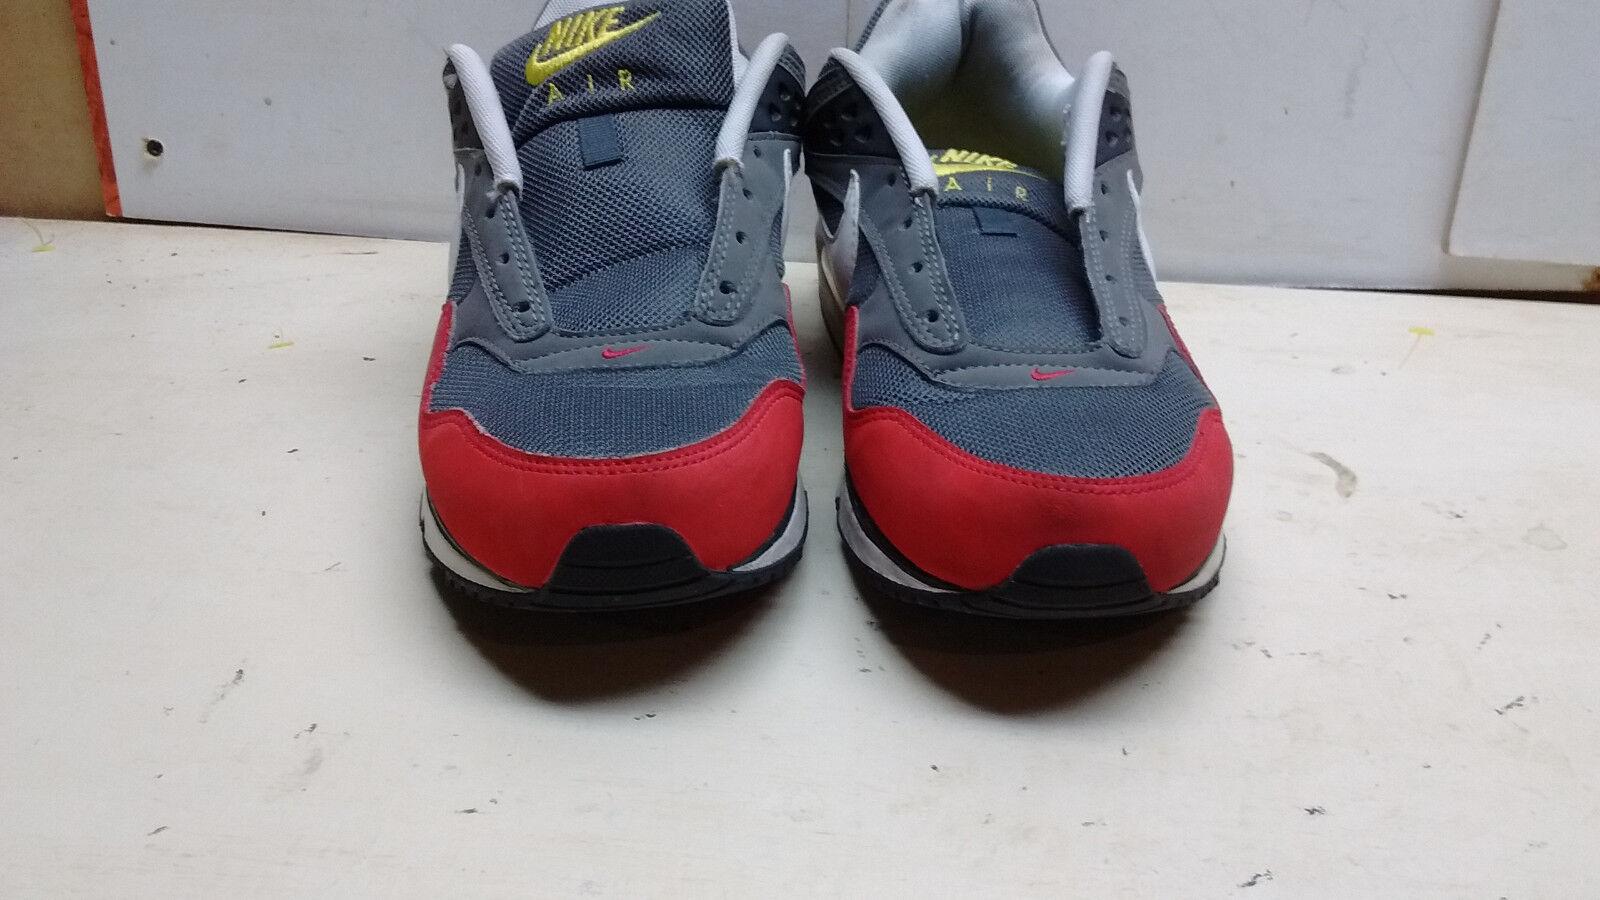 Nike Air Max 2012 Men ROT Gray Sneaker Athletic Running Hiking Hiking Running Sports Schuhe 10 M 0cfc17